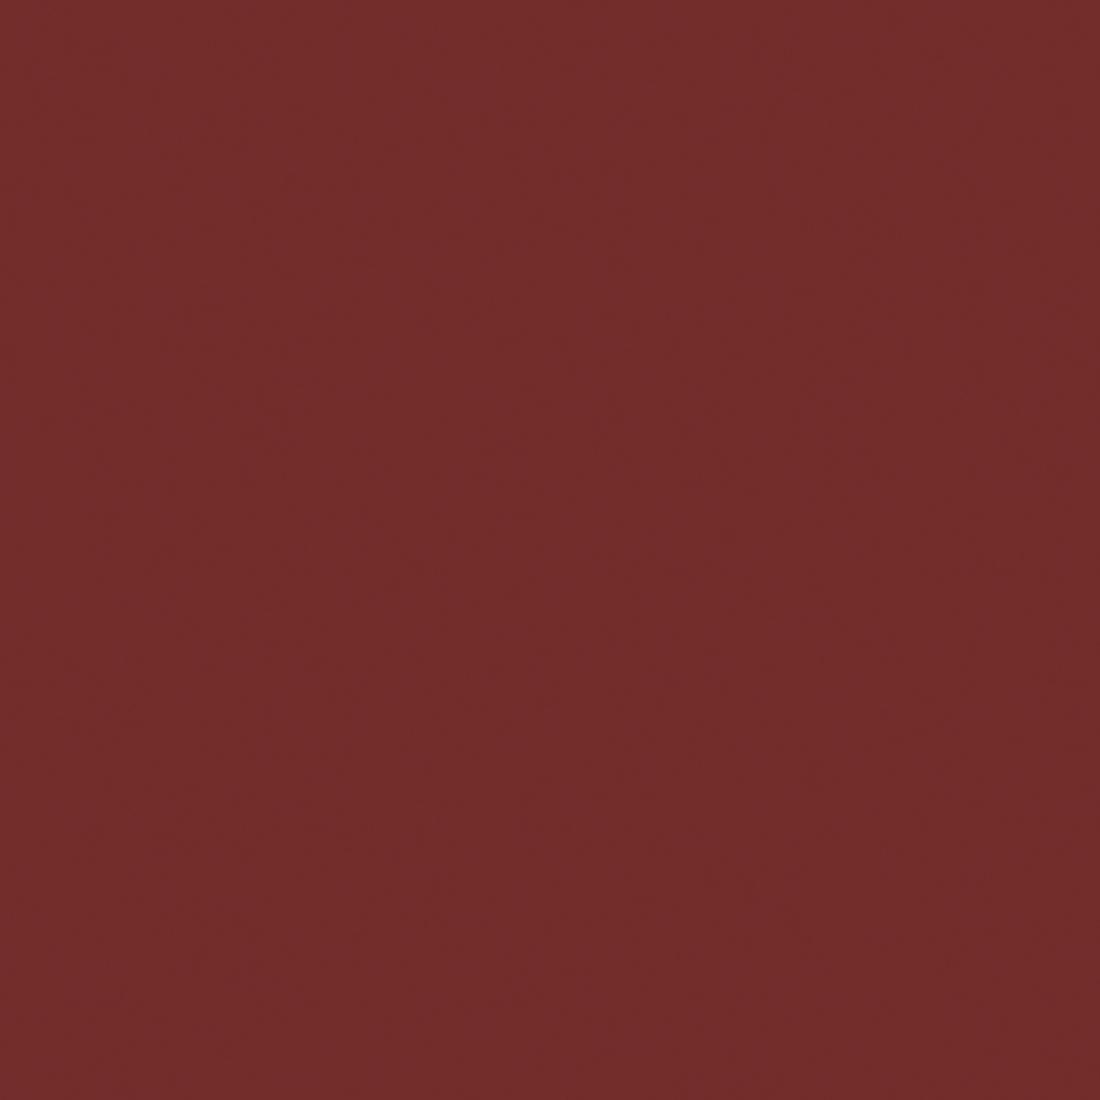 PAL Melaminat Roșu Oxide 9551 BS Kronospan